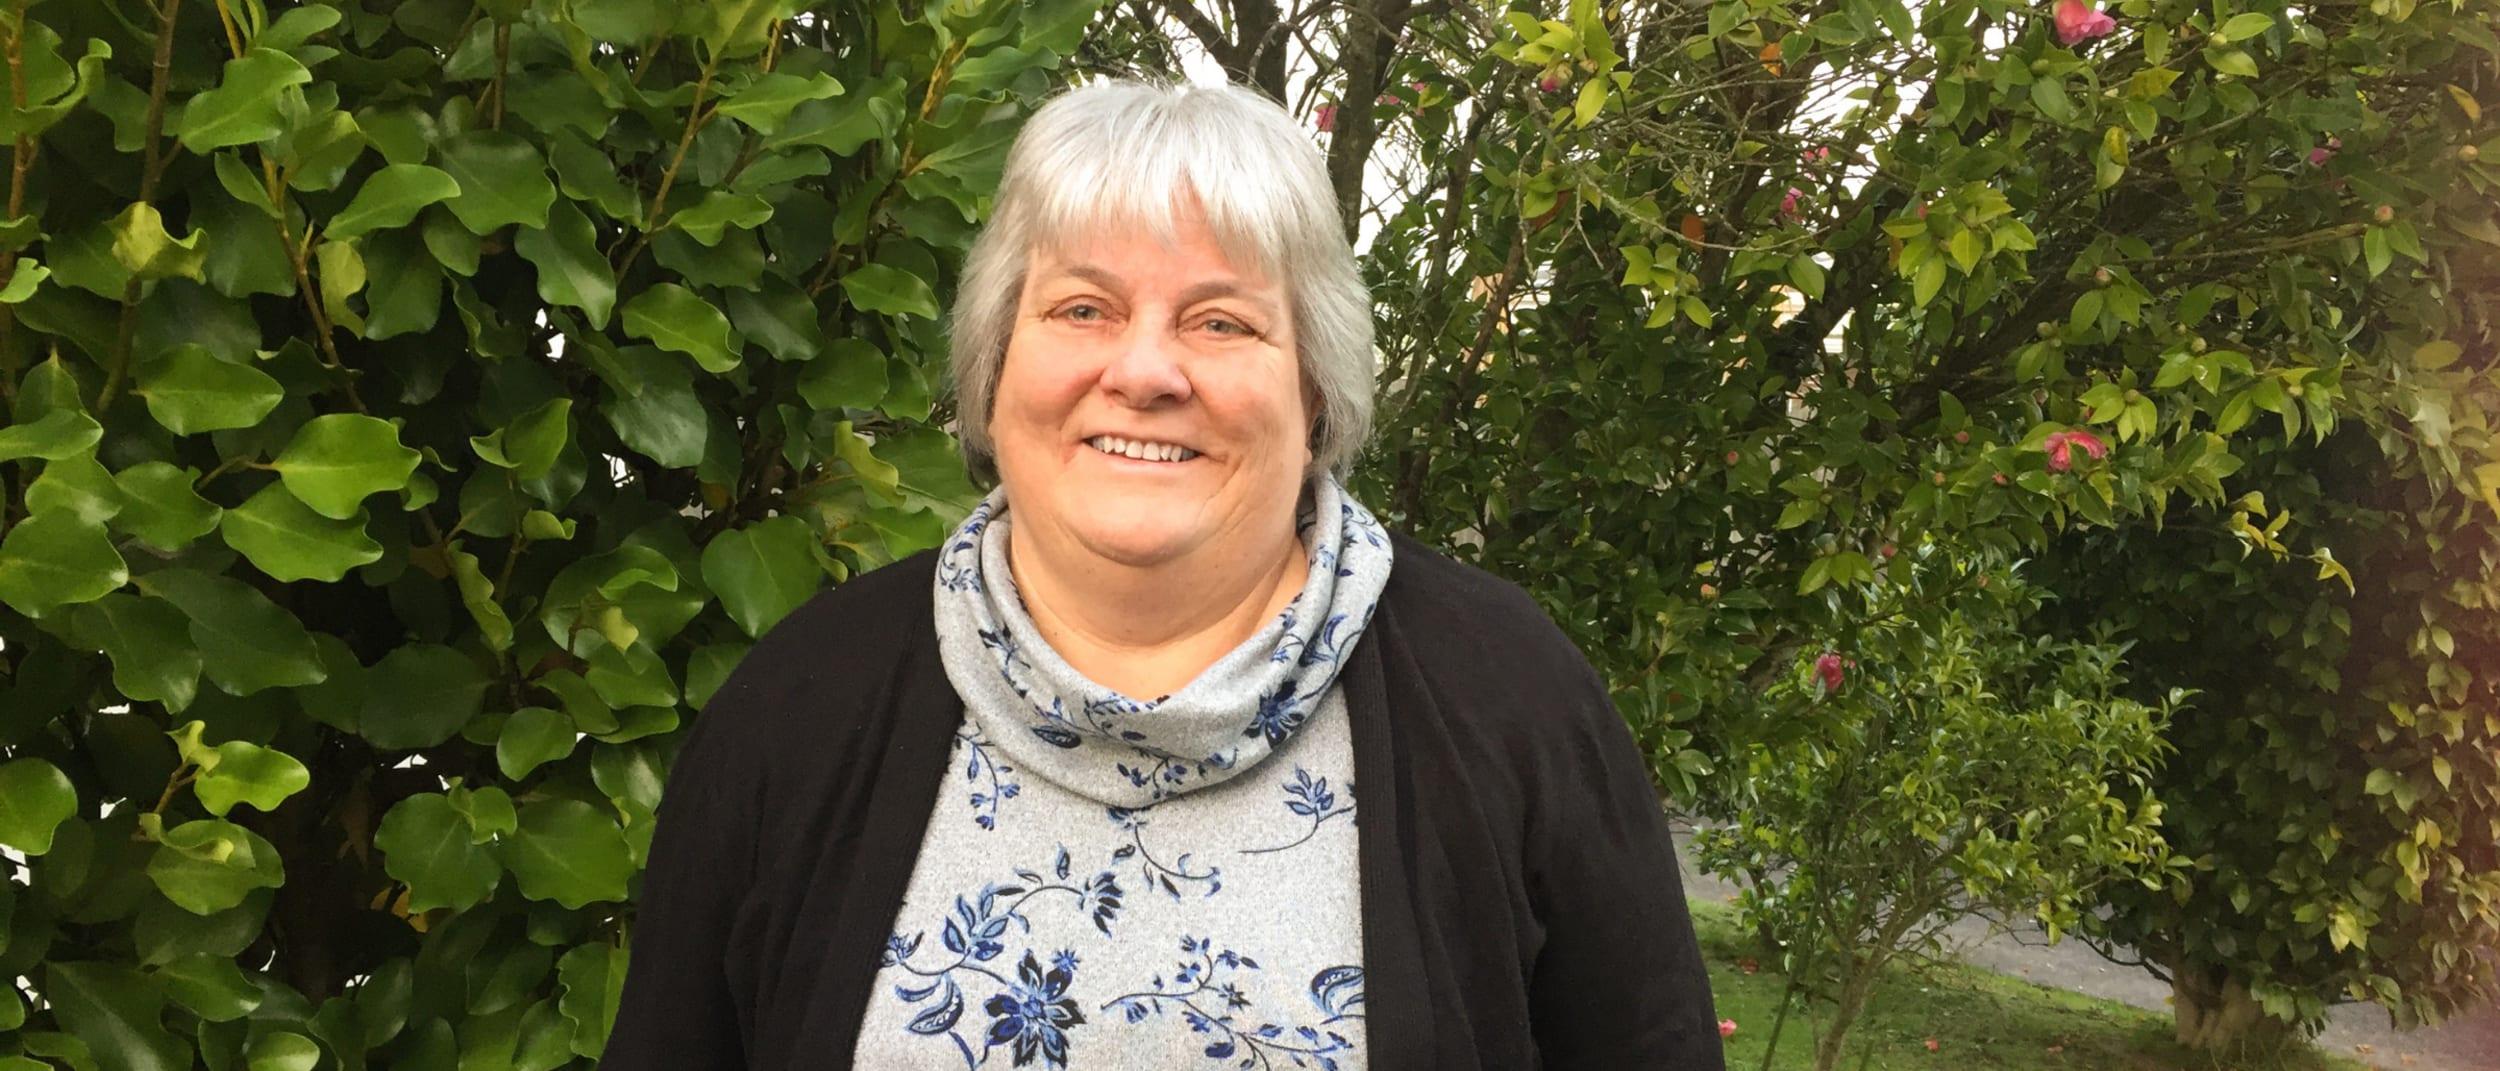 Meet Deborah McLarin - Westfield Local Heroes 2021